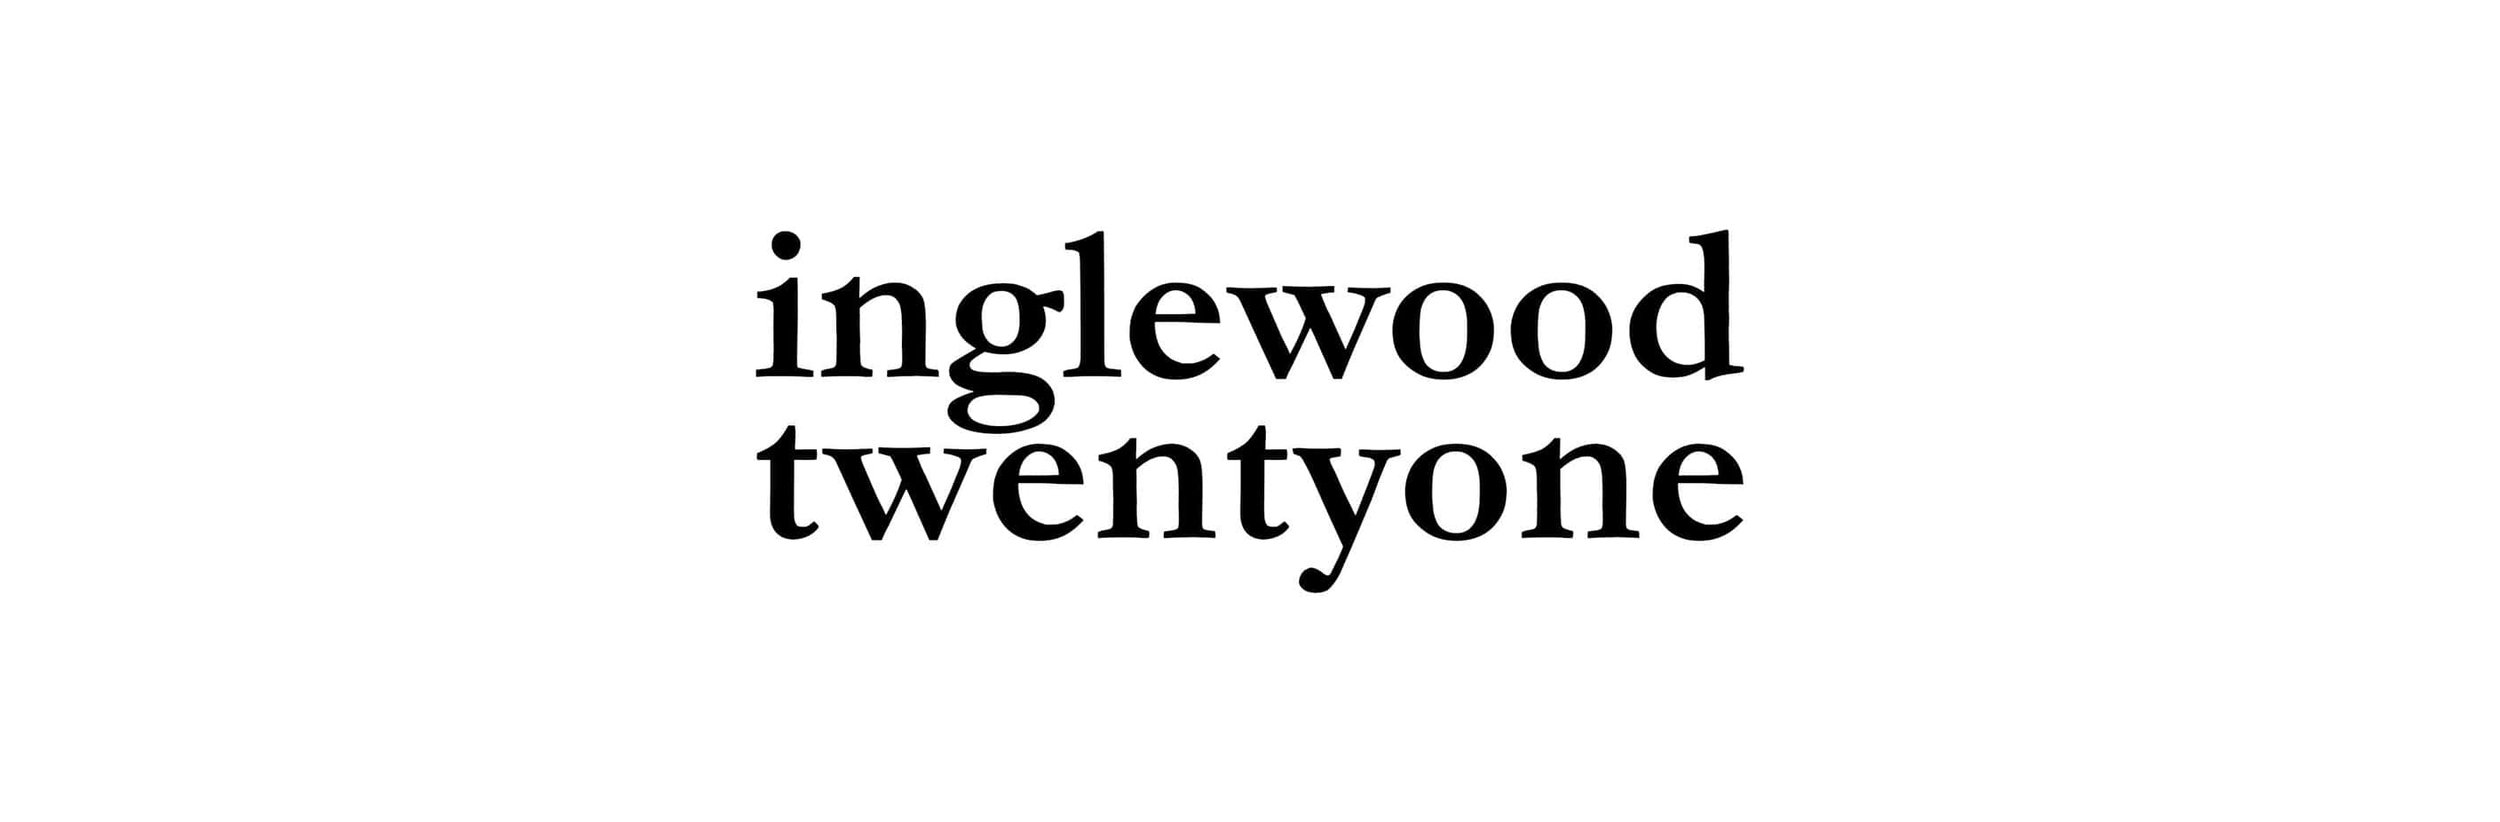 18-03 Inglewood 21 - Title Banner-min.jpg